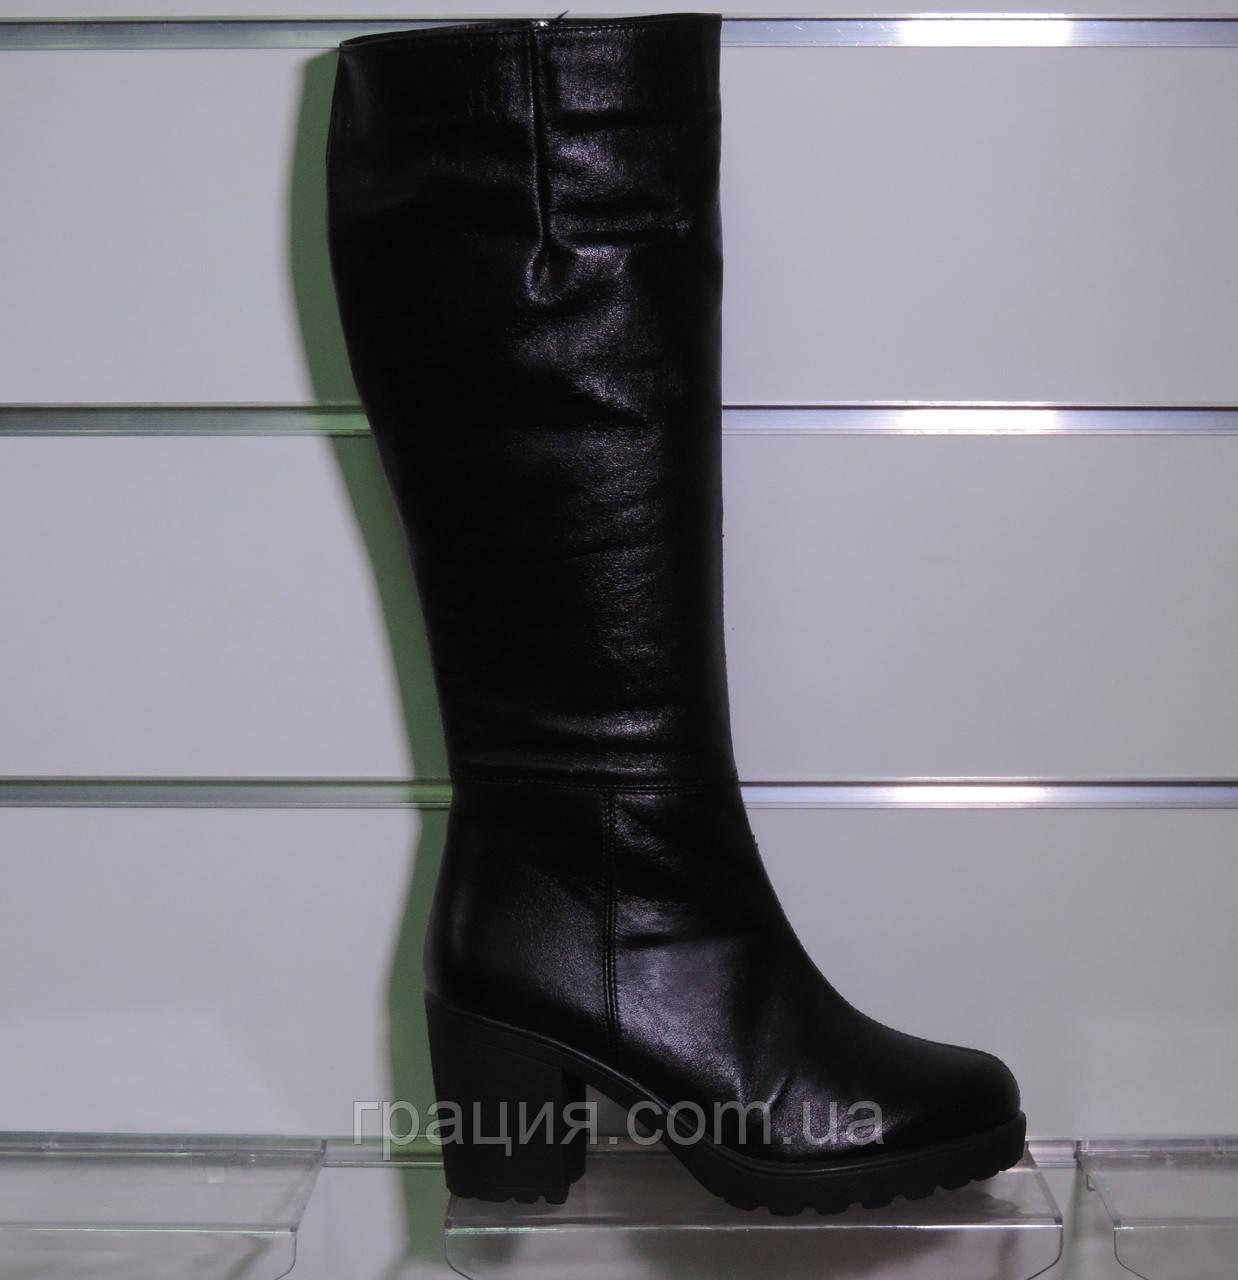 Сапоги женские зимние на каблуке